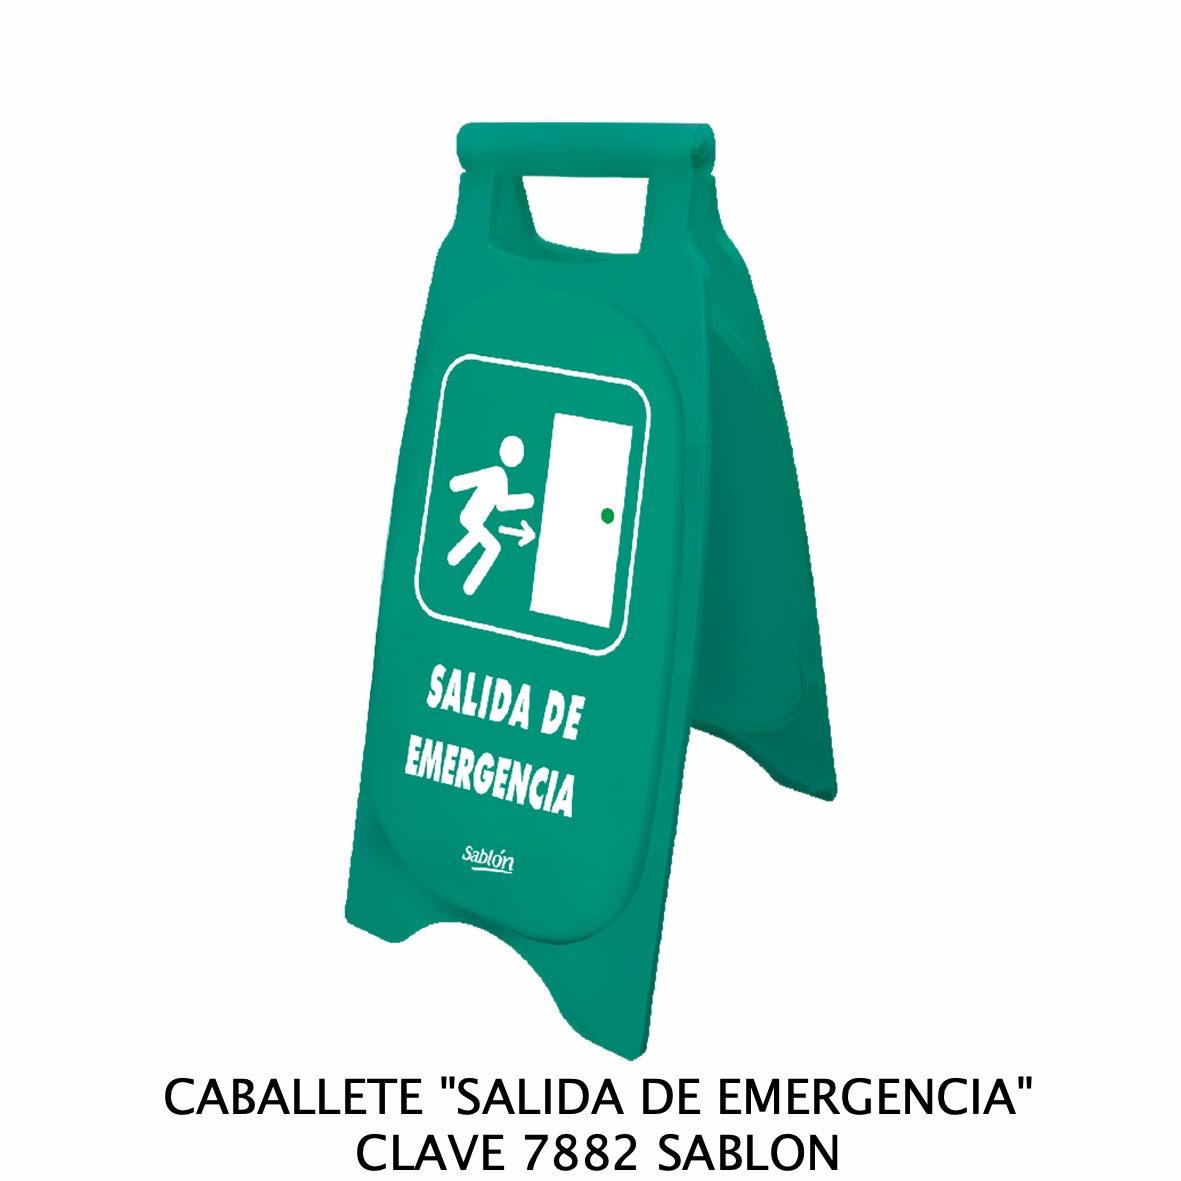 Caballete con señal SALIDA DE EMERGENCIA Clave 7882 de Sablón